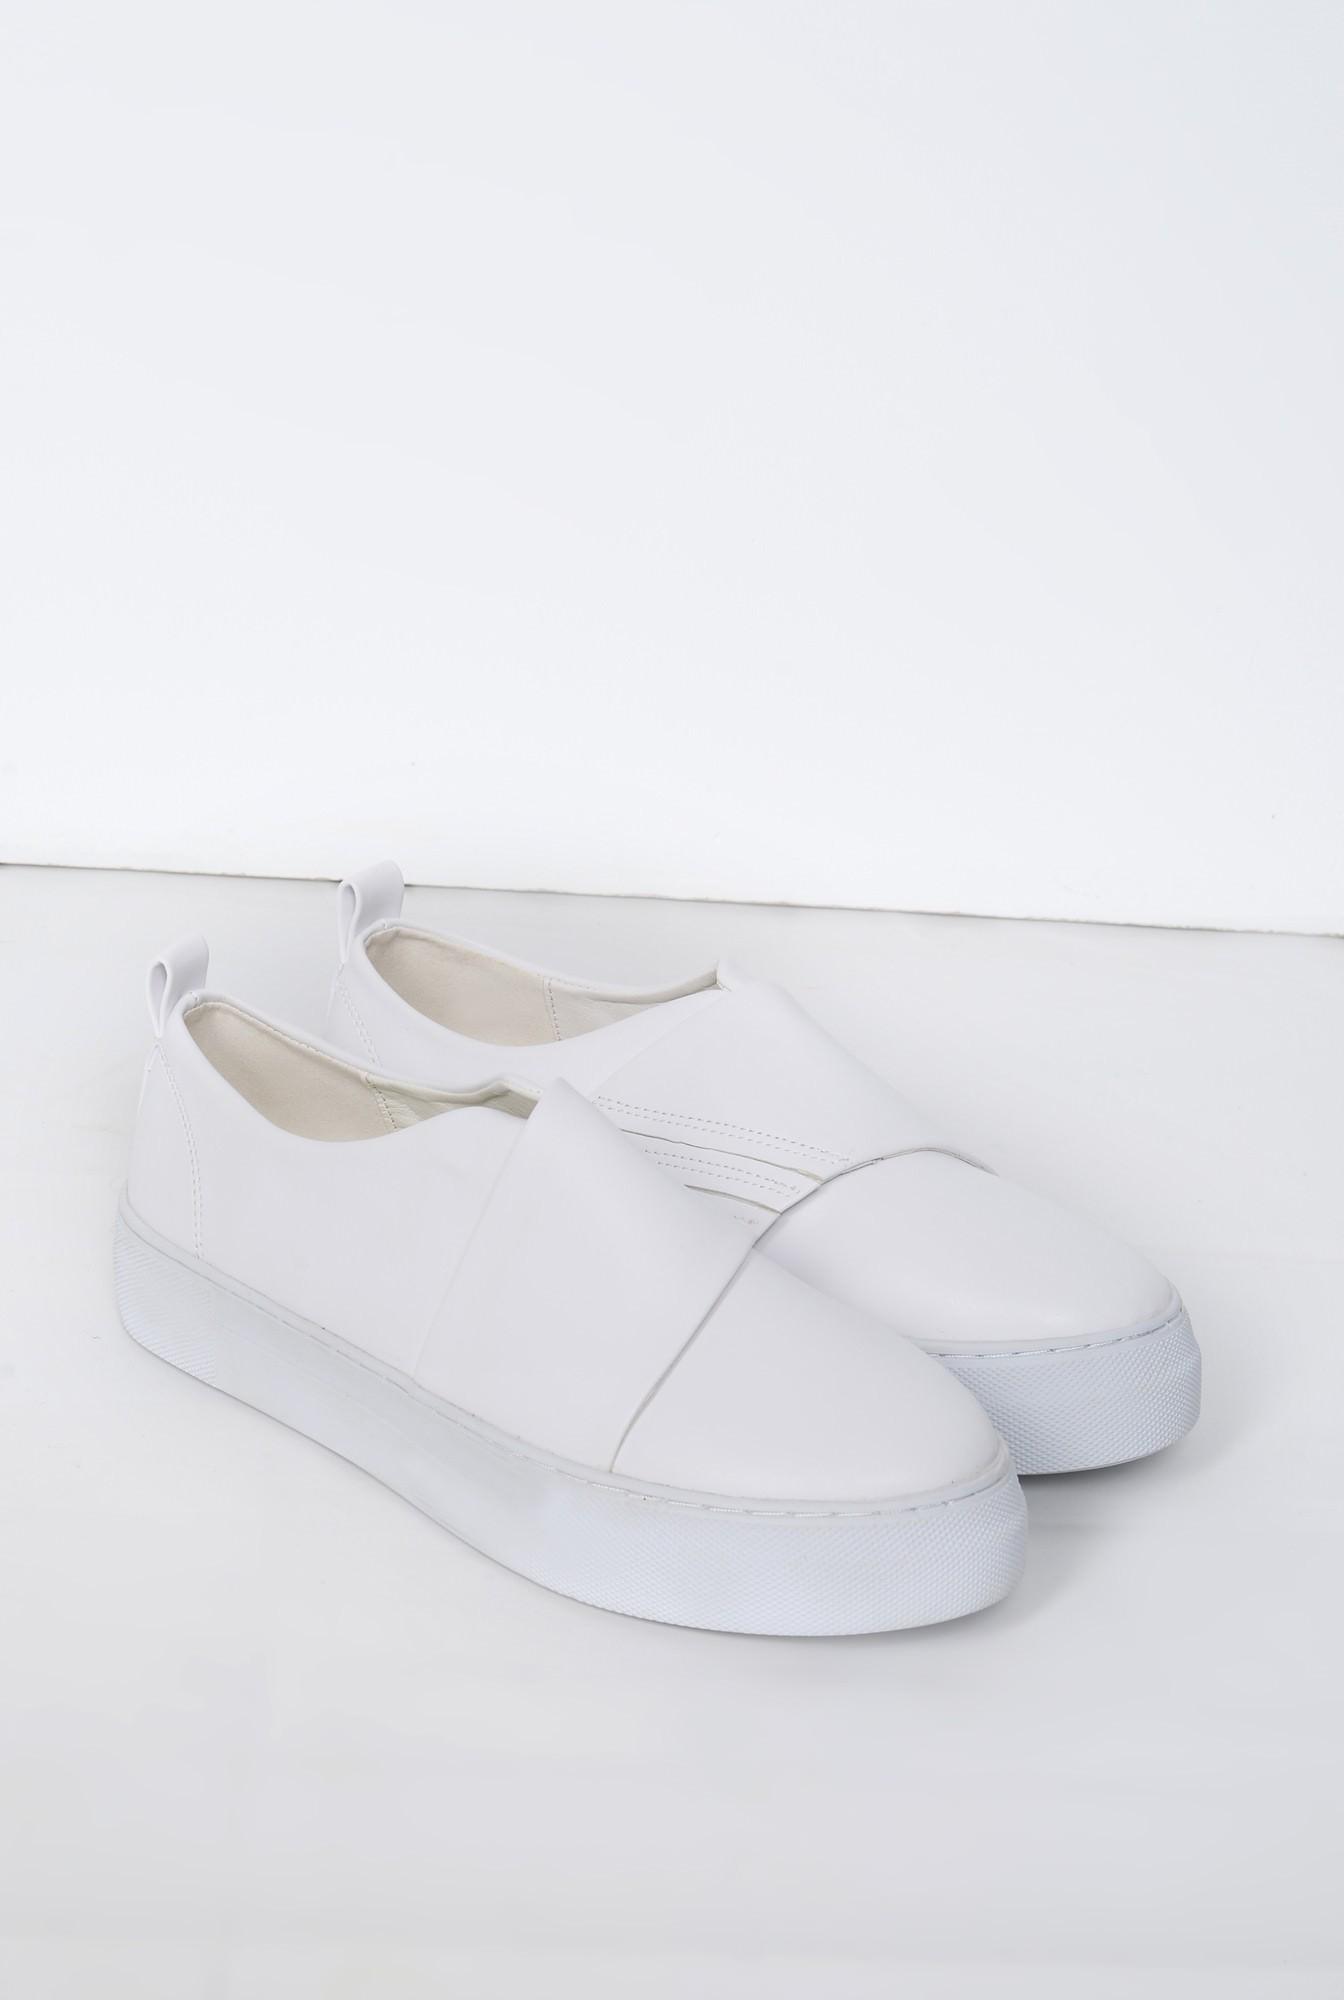 1 - Sneakers PO12091606-ALB